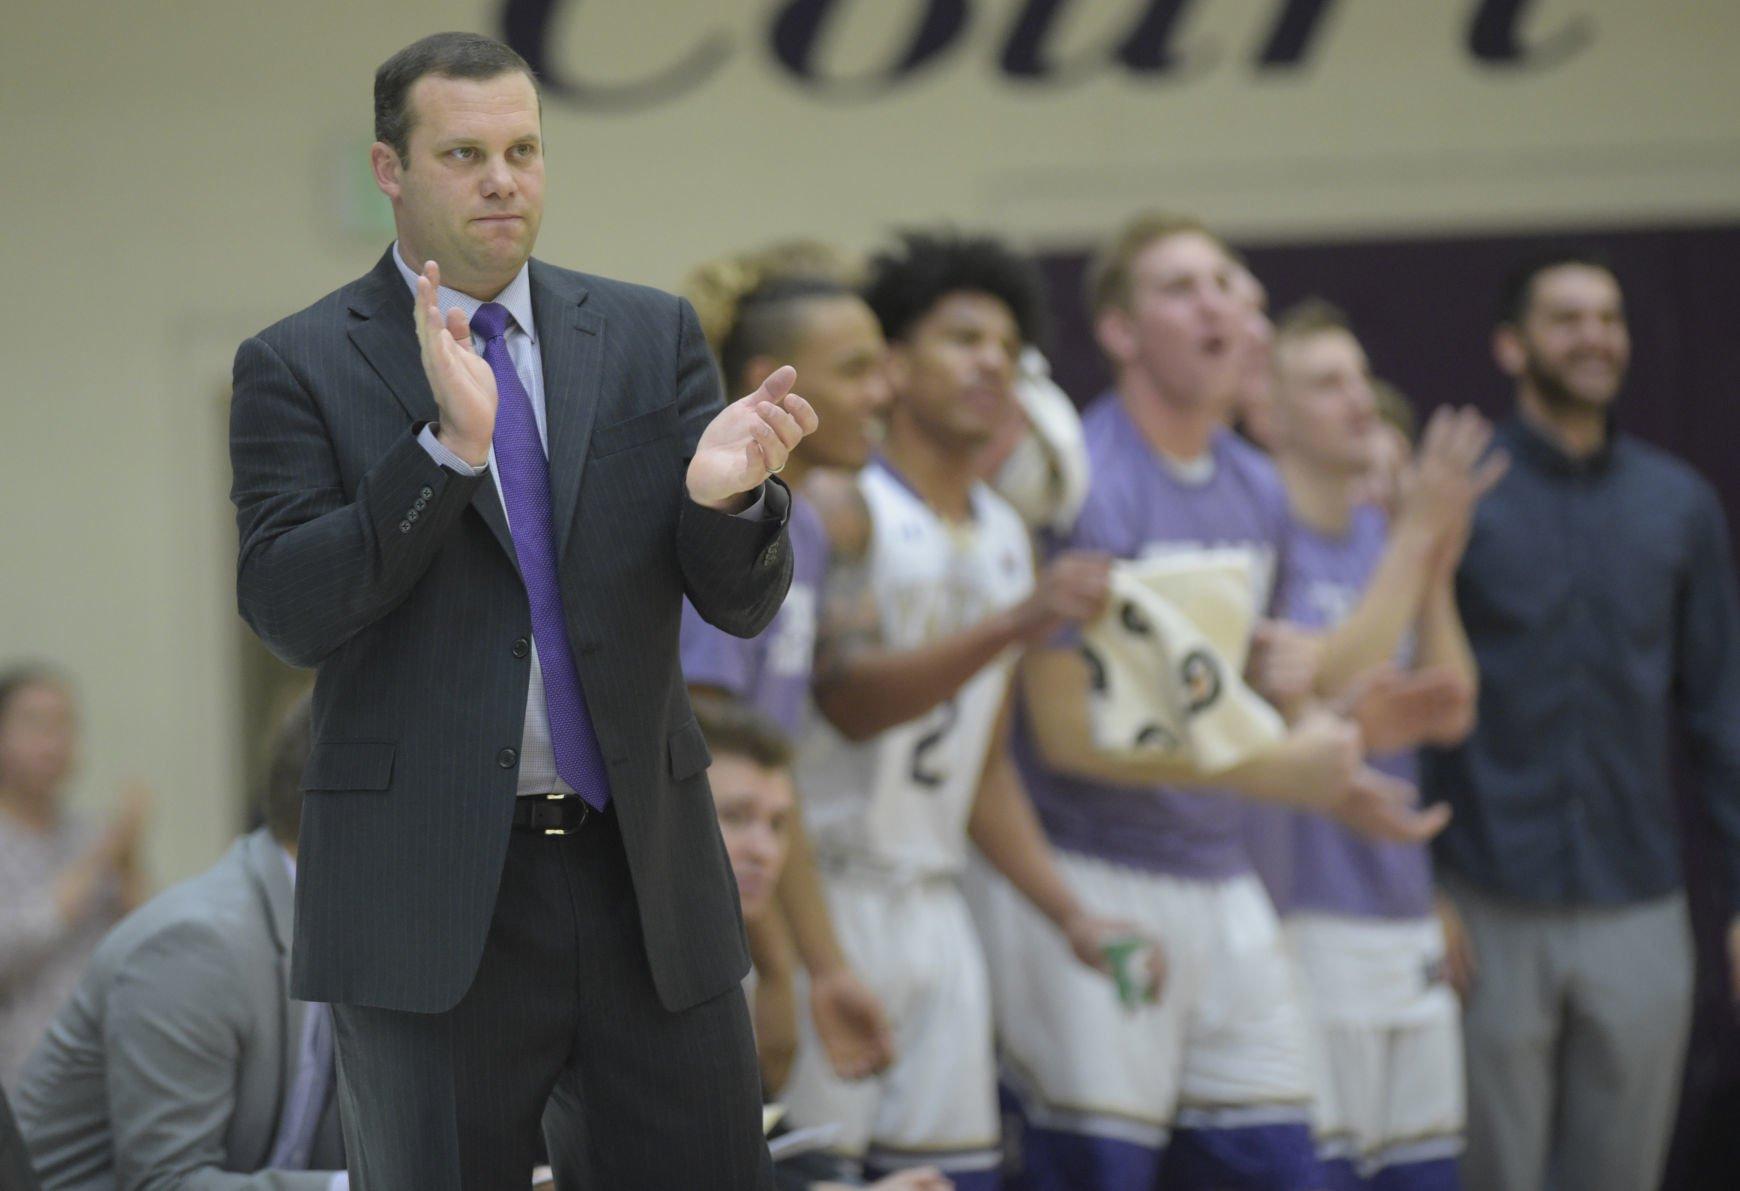 College of Idaho men's basketball coach Scott Garson steps down to take assistant coaching job at Santa Clara | Idaho Press